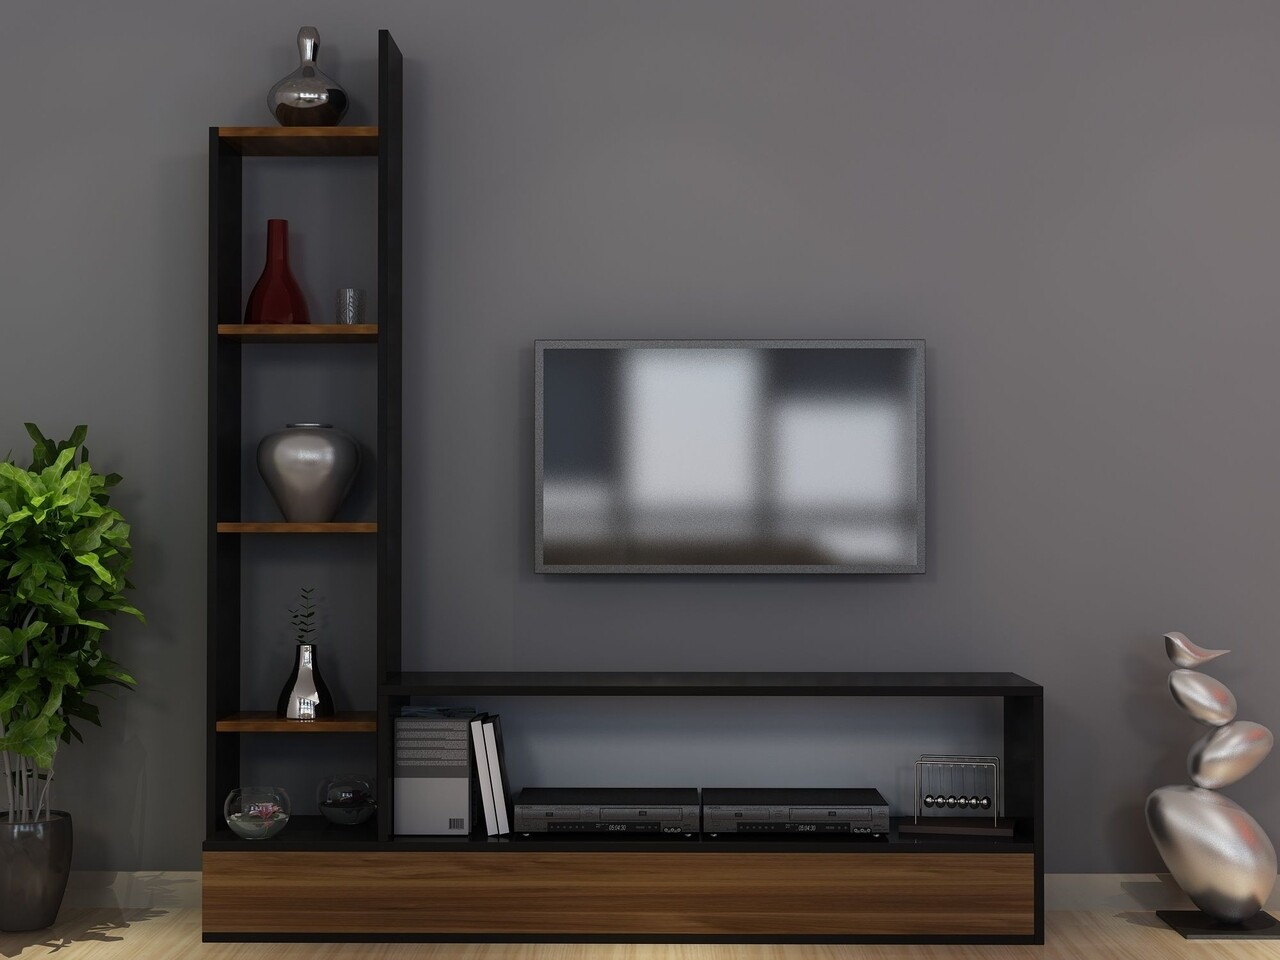 Comoda TV AKEL, Gauge Concept, 152x30x169 cm, PAL, aluna/negru